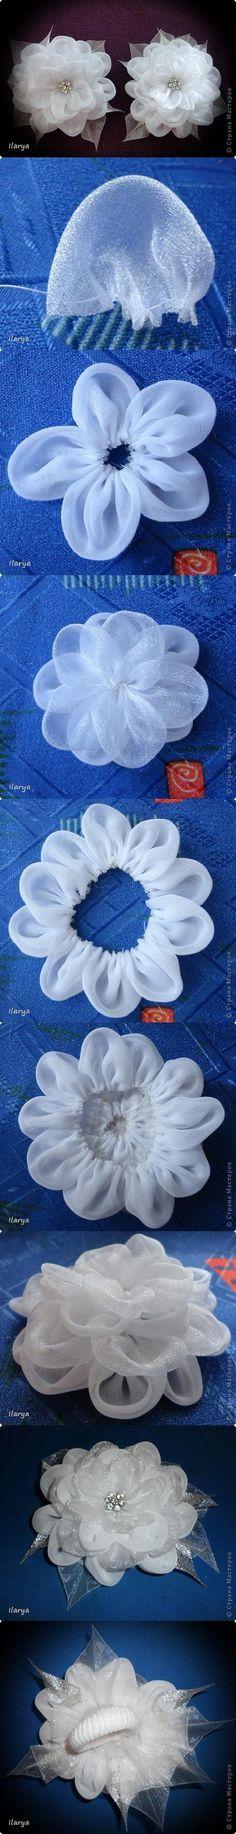 DIY Fabric Lust Flower DIY Fabric Lust Flower by diyforever